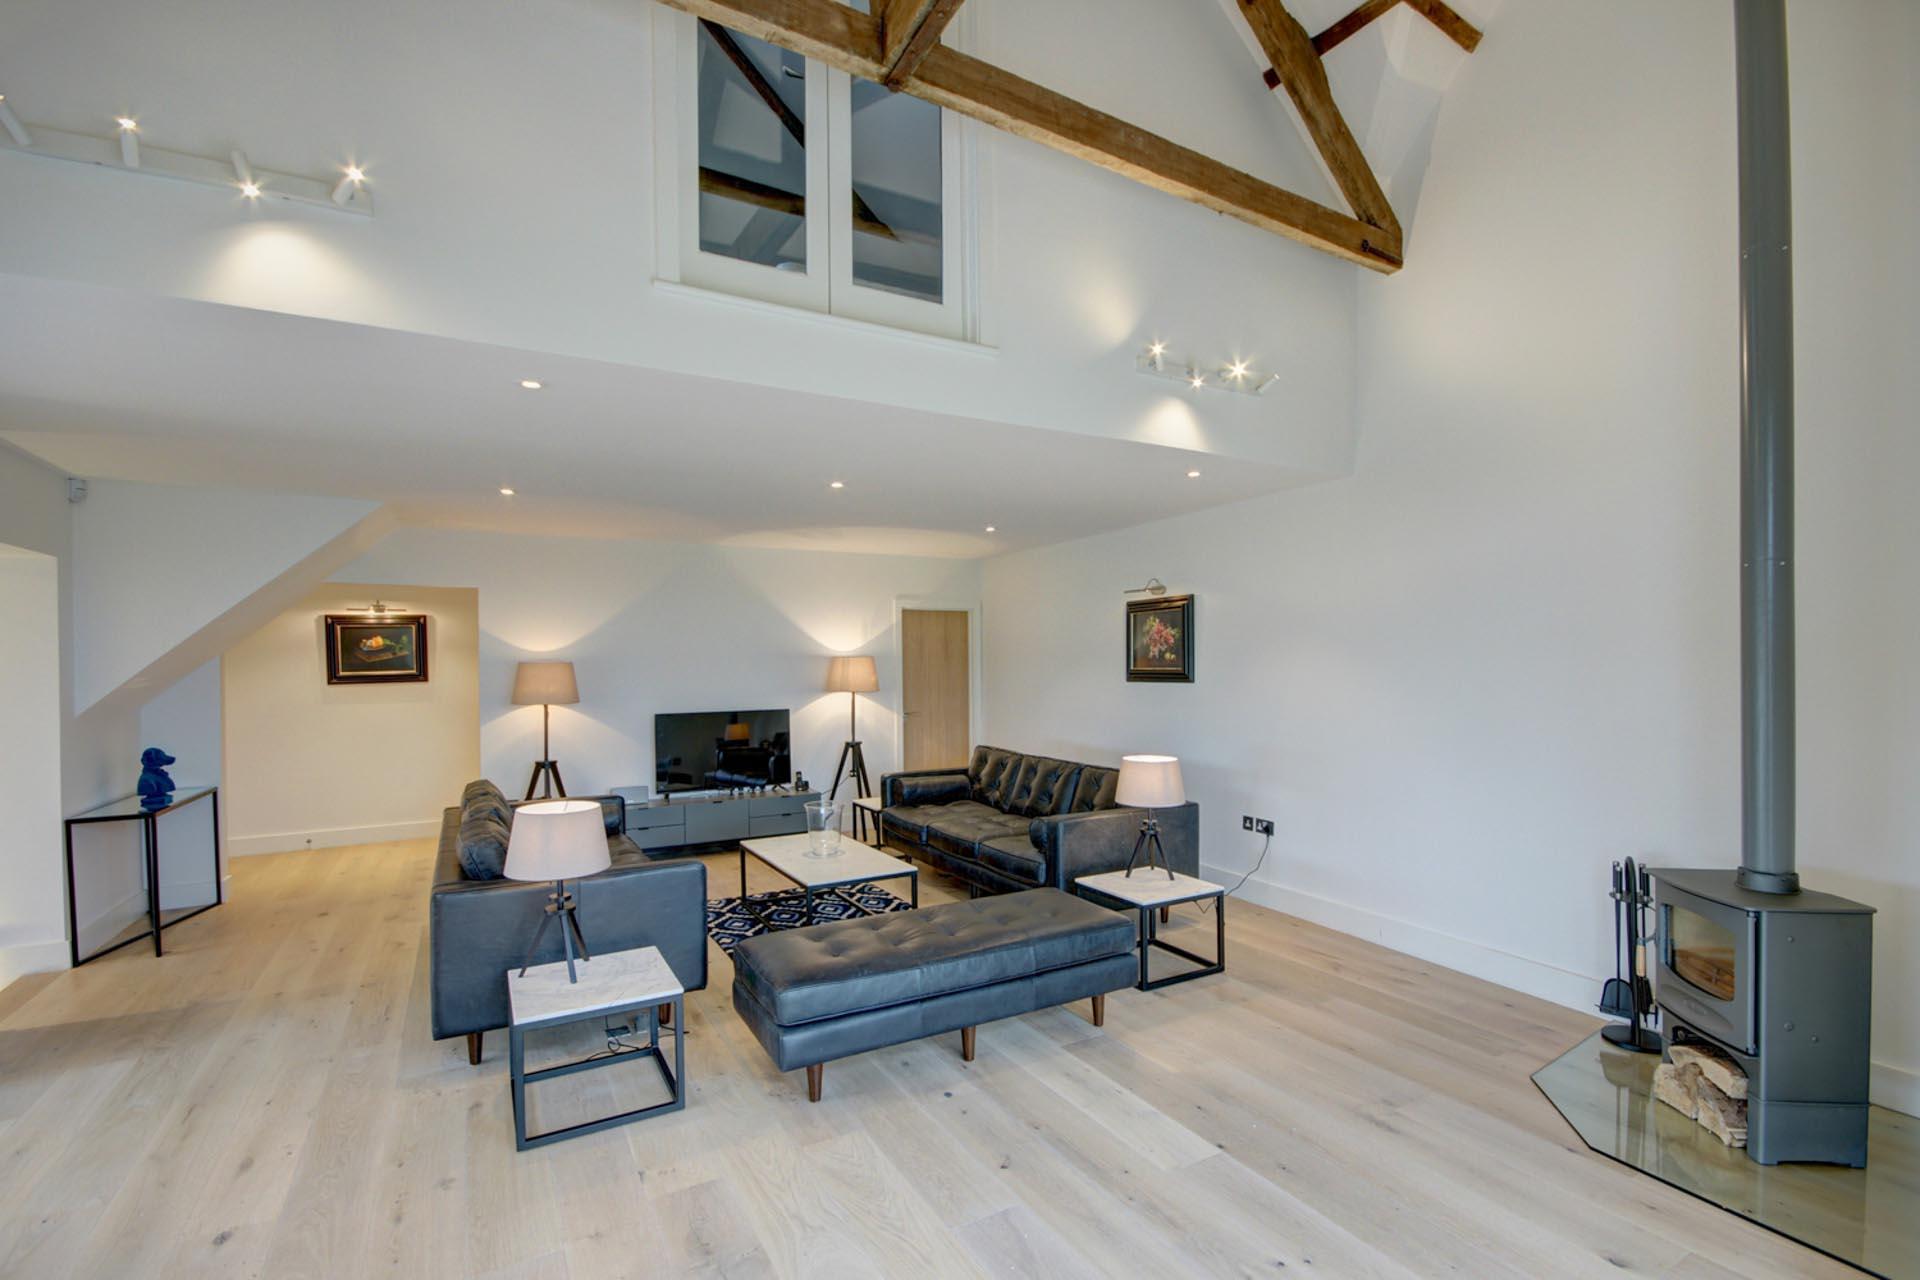 black sofas in barn conversion